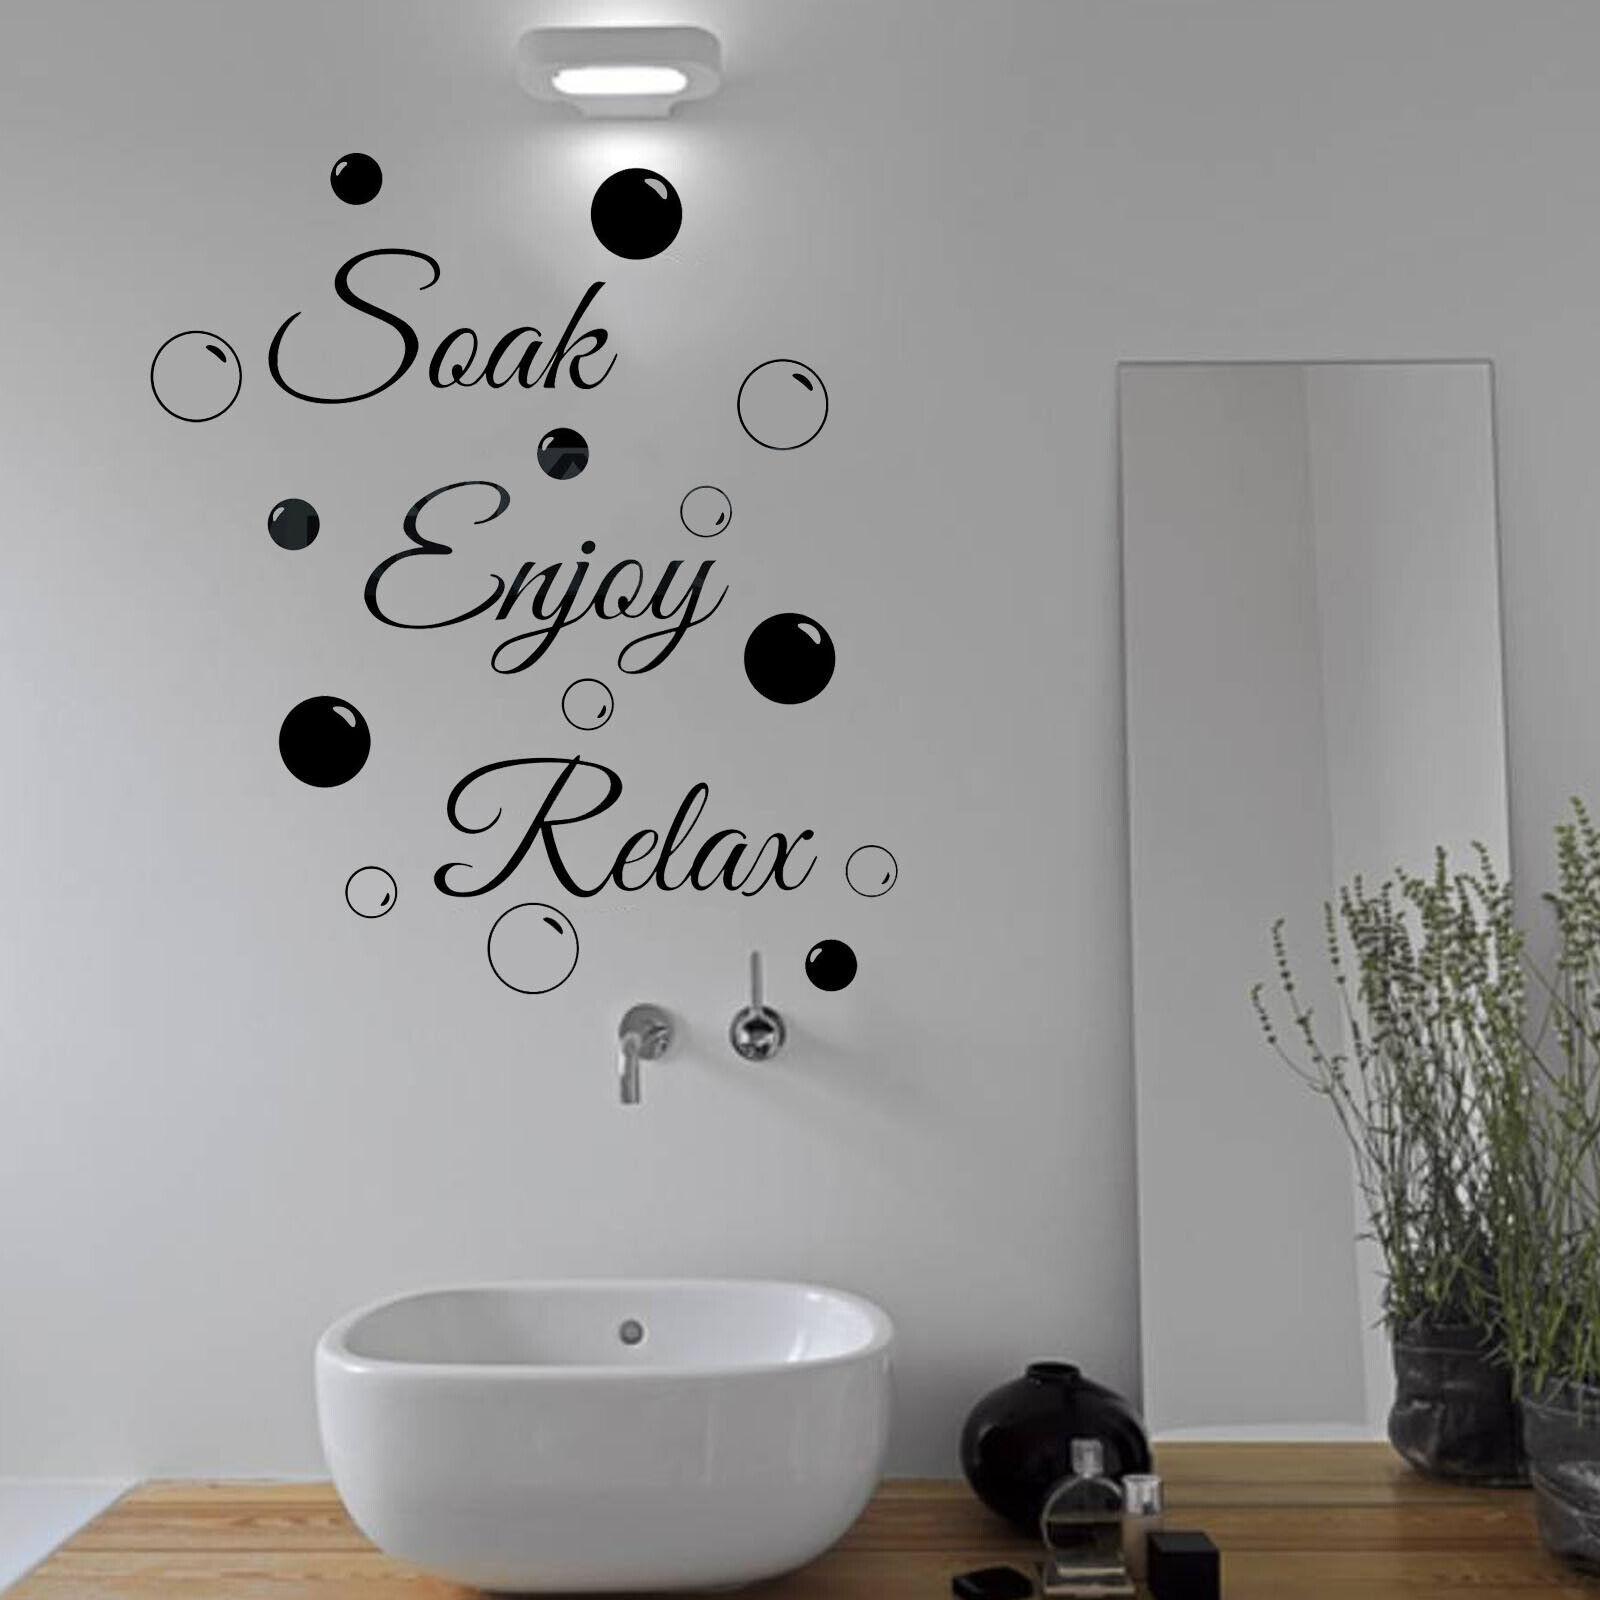 Home Decoration - Soak Relax Enjoy Wall Vinyl Stickers & Bubbles Decals Bathroom Home Art Decor